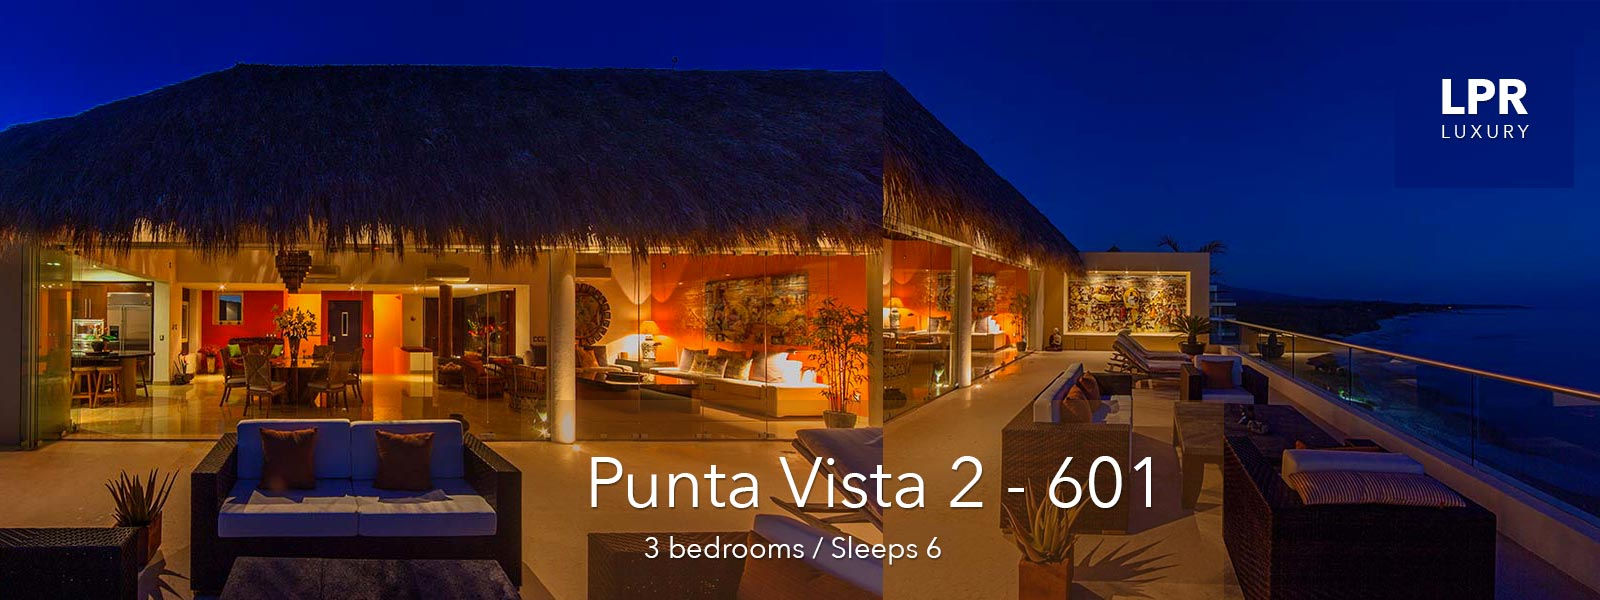 Punta Vista 2 - Penthouse 601 - Playa Punta de Mita - Condos for Sale